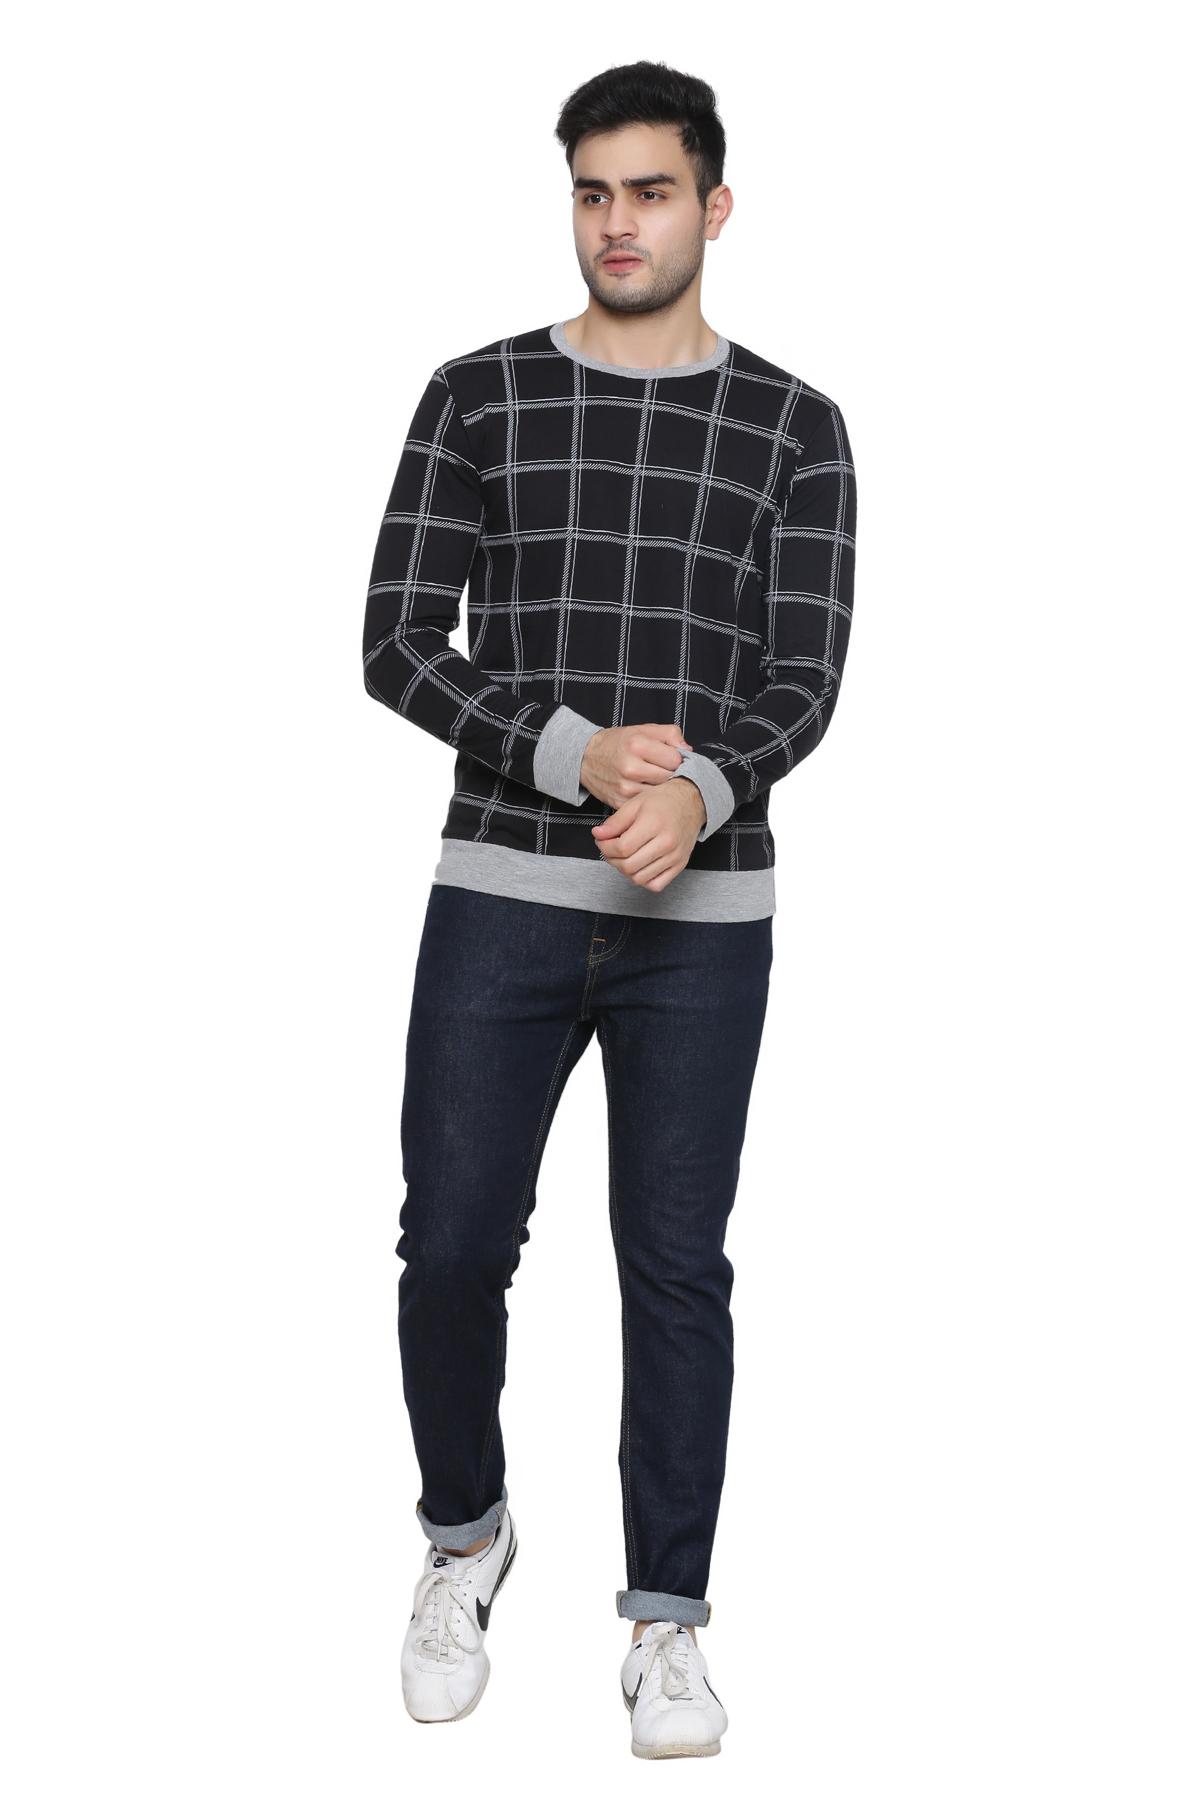 GENTINO Men's Full Sleeve Striped Black Round Neck T Shirt